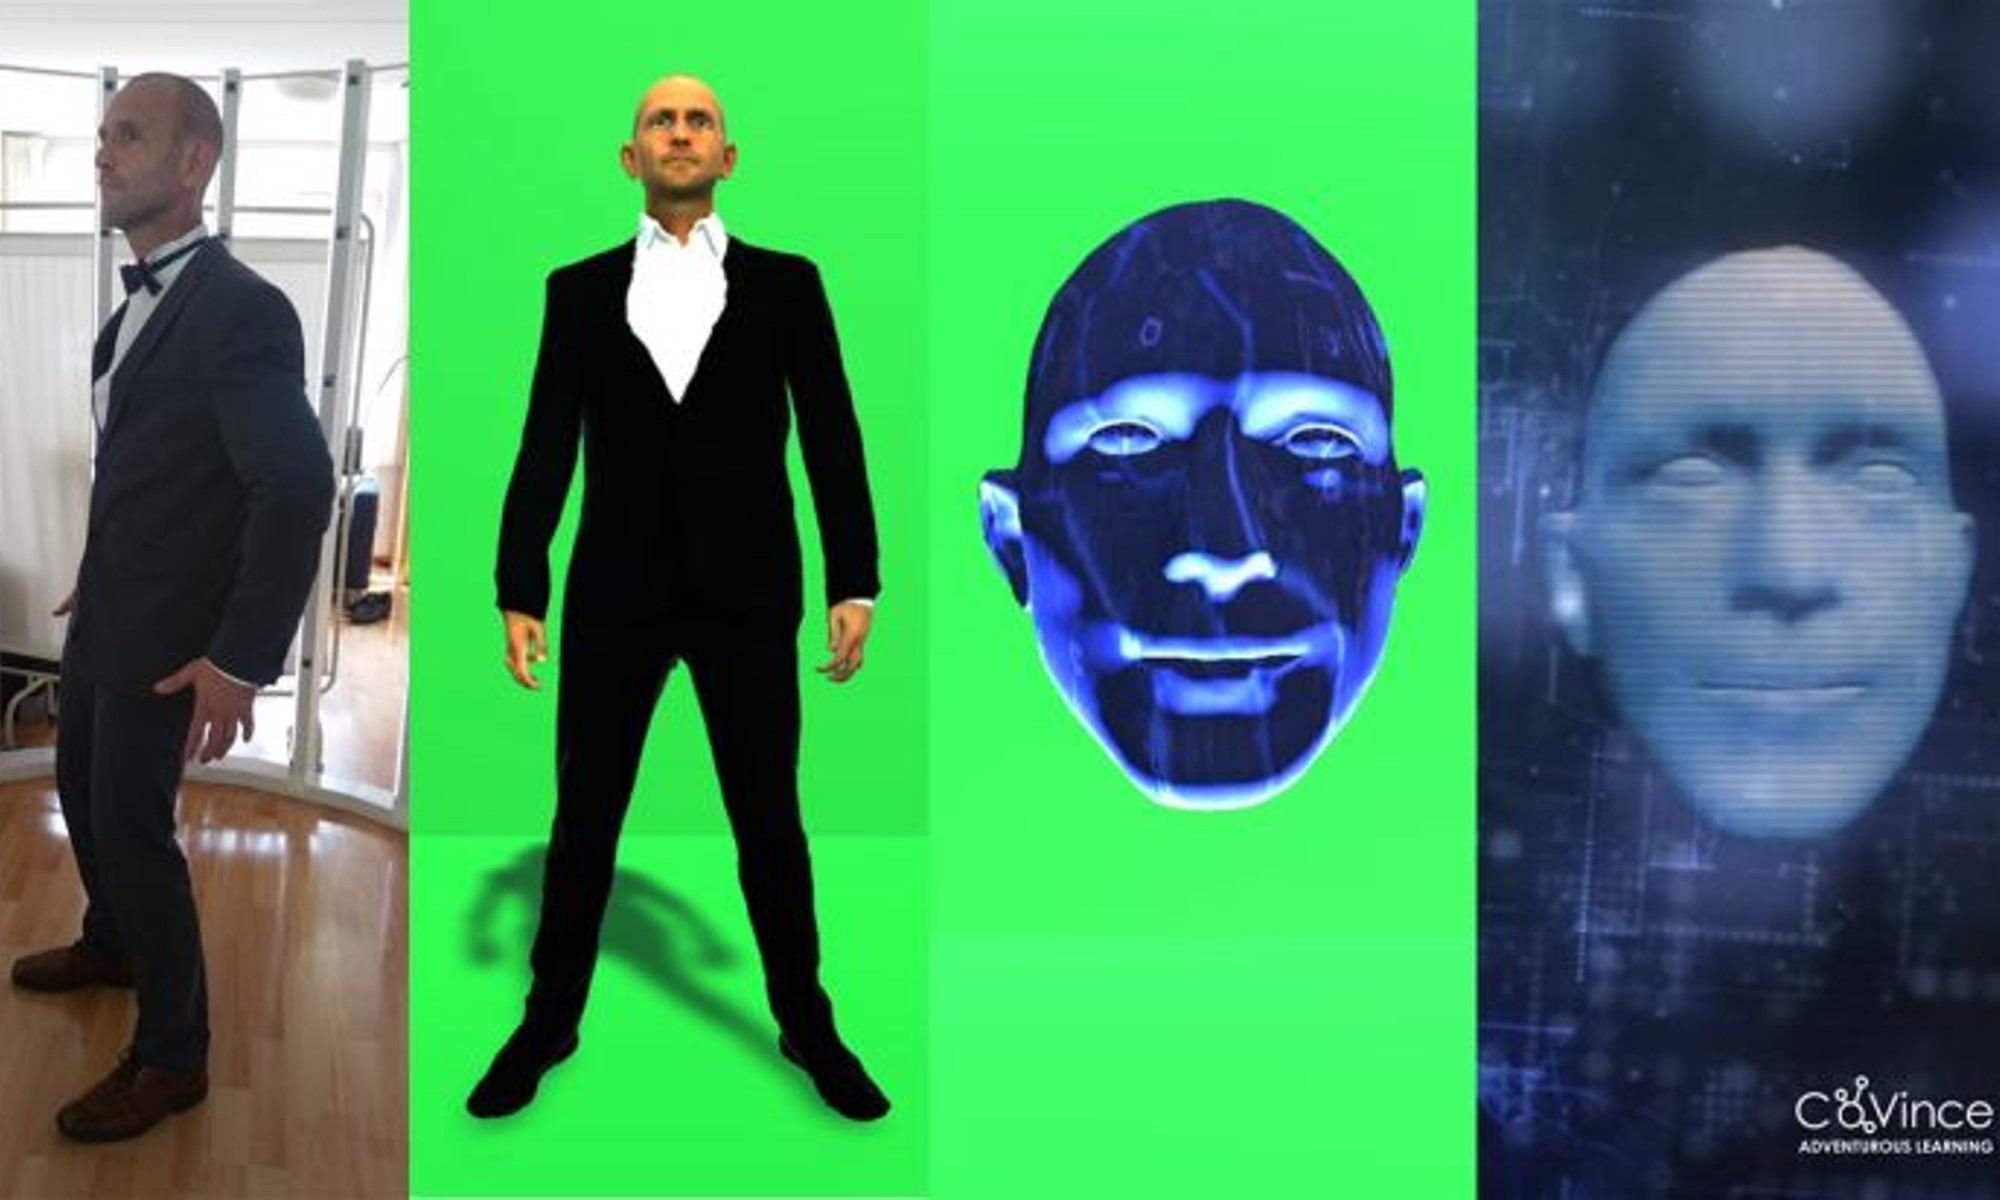 CoVinceComputable3DHolograms2000x1200 - Sanders Hulsman's Avatar Visual Voice @Computable Awards